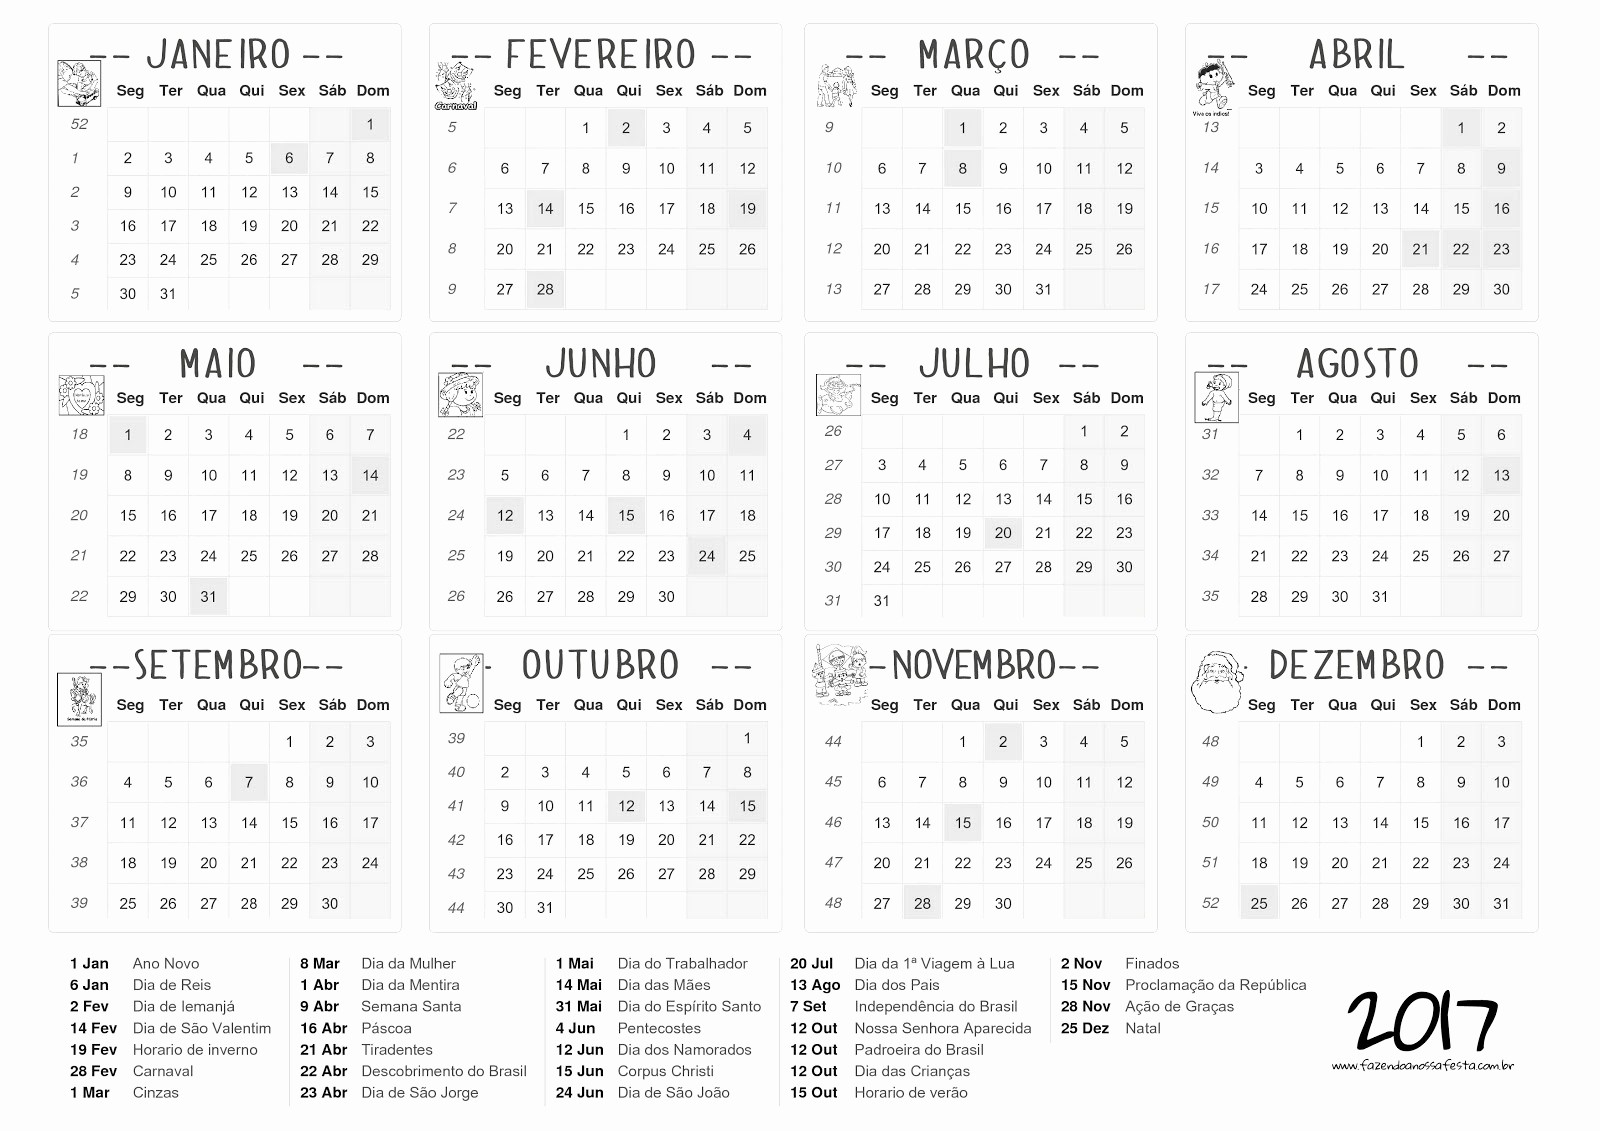 Calendario Juliano 2017 Para Imprimir Unique Calendário 2017 Imprimir E Baixar — SÓ Escola